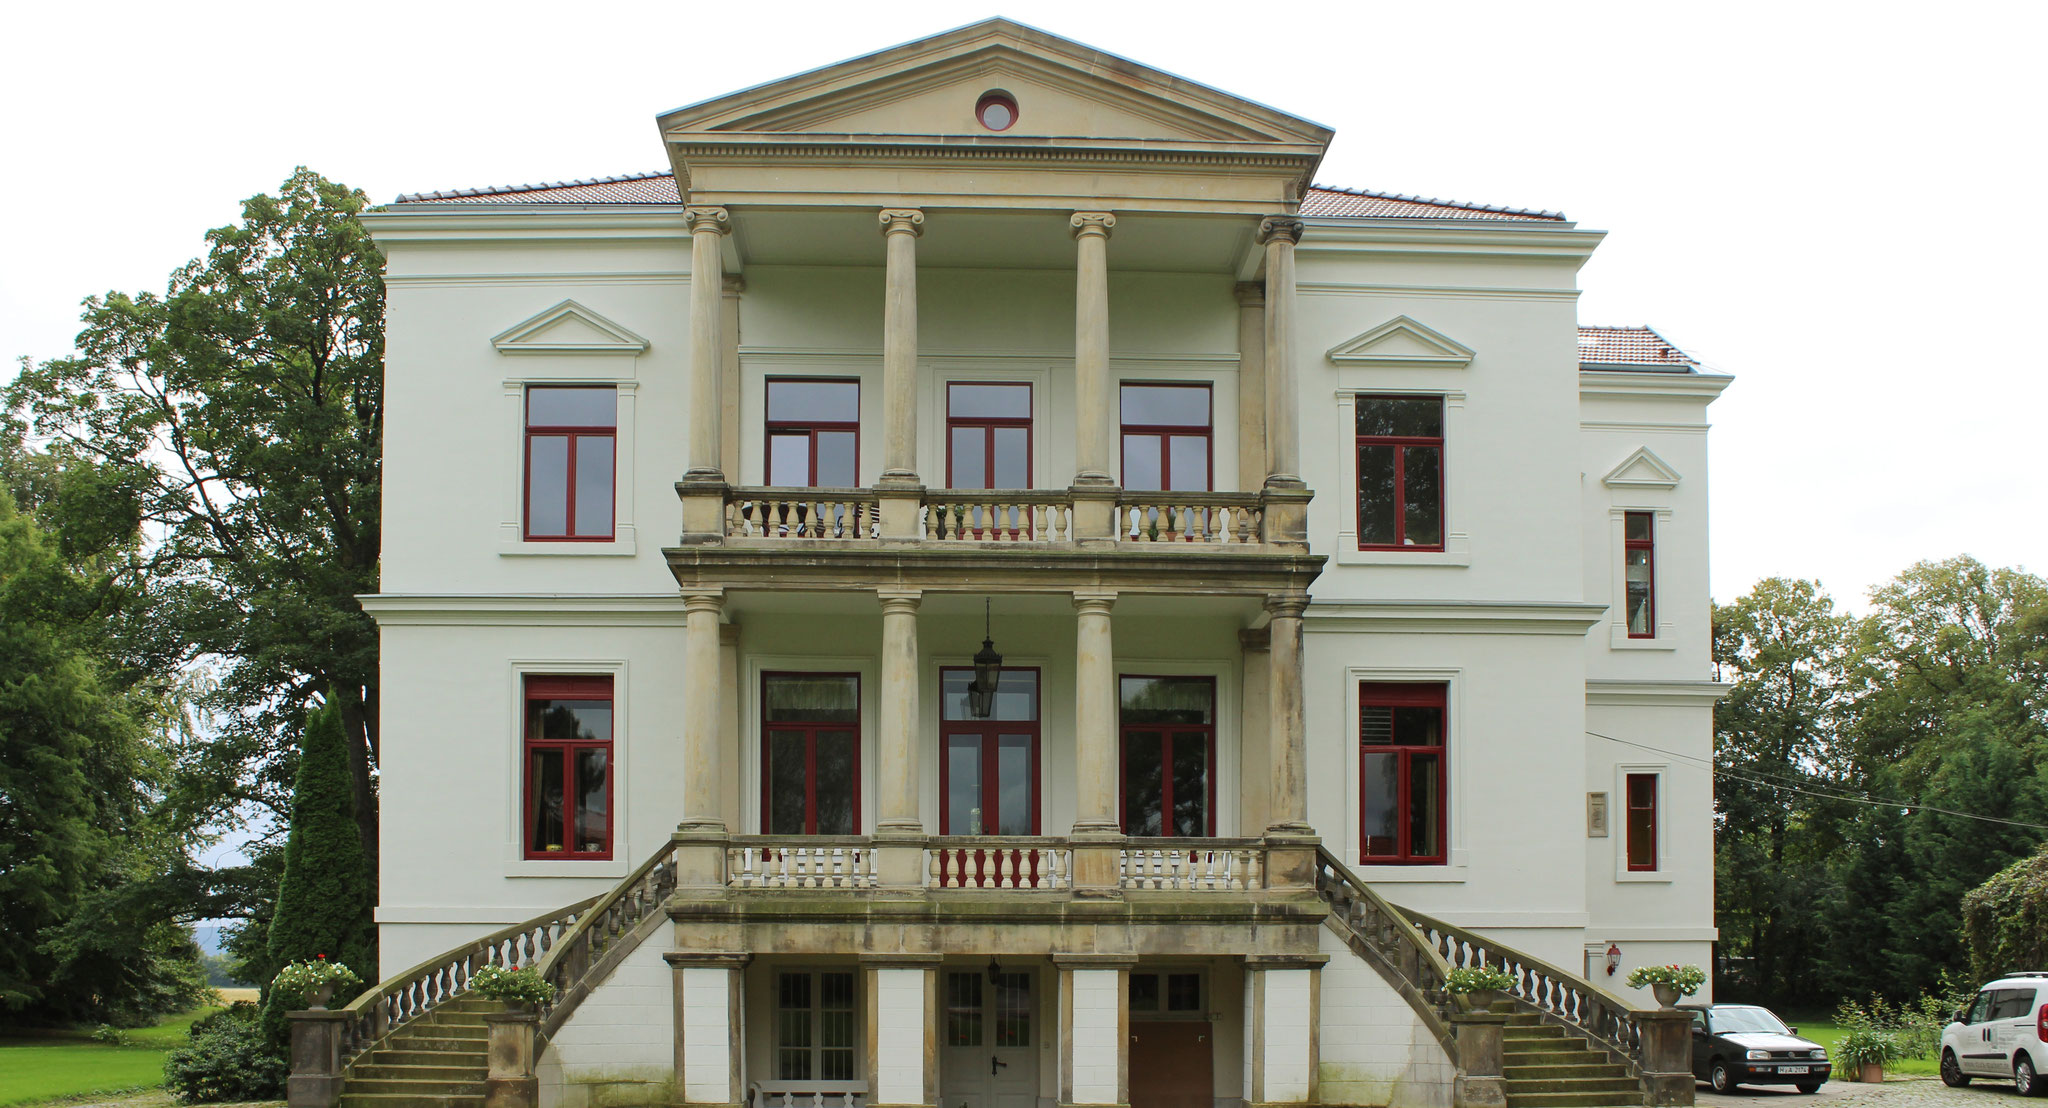 Stuckrestaurierung; Fassadenbeschichtung mit KEIM Granital-System